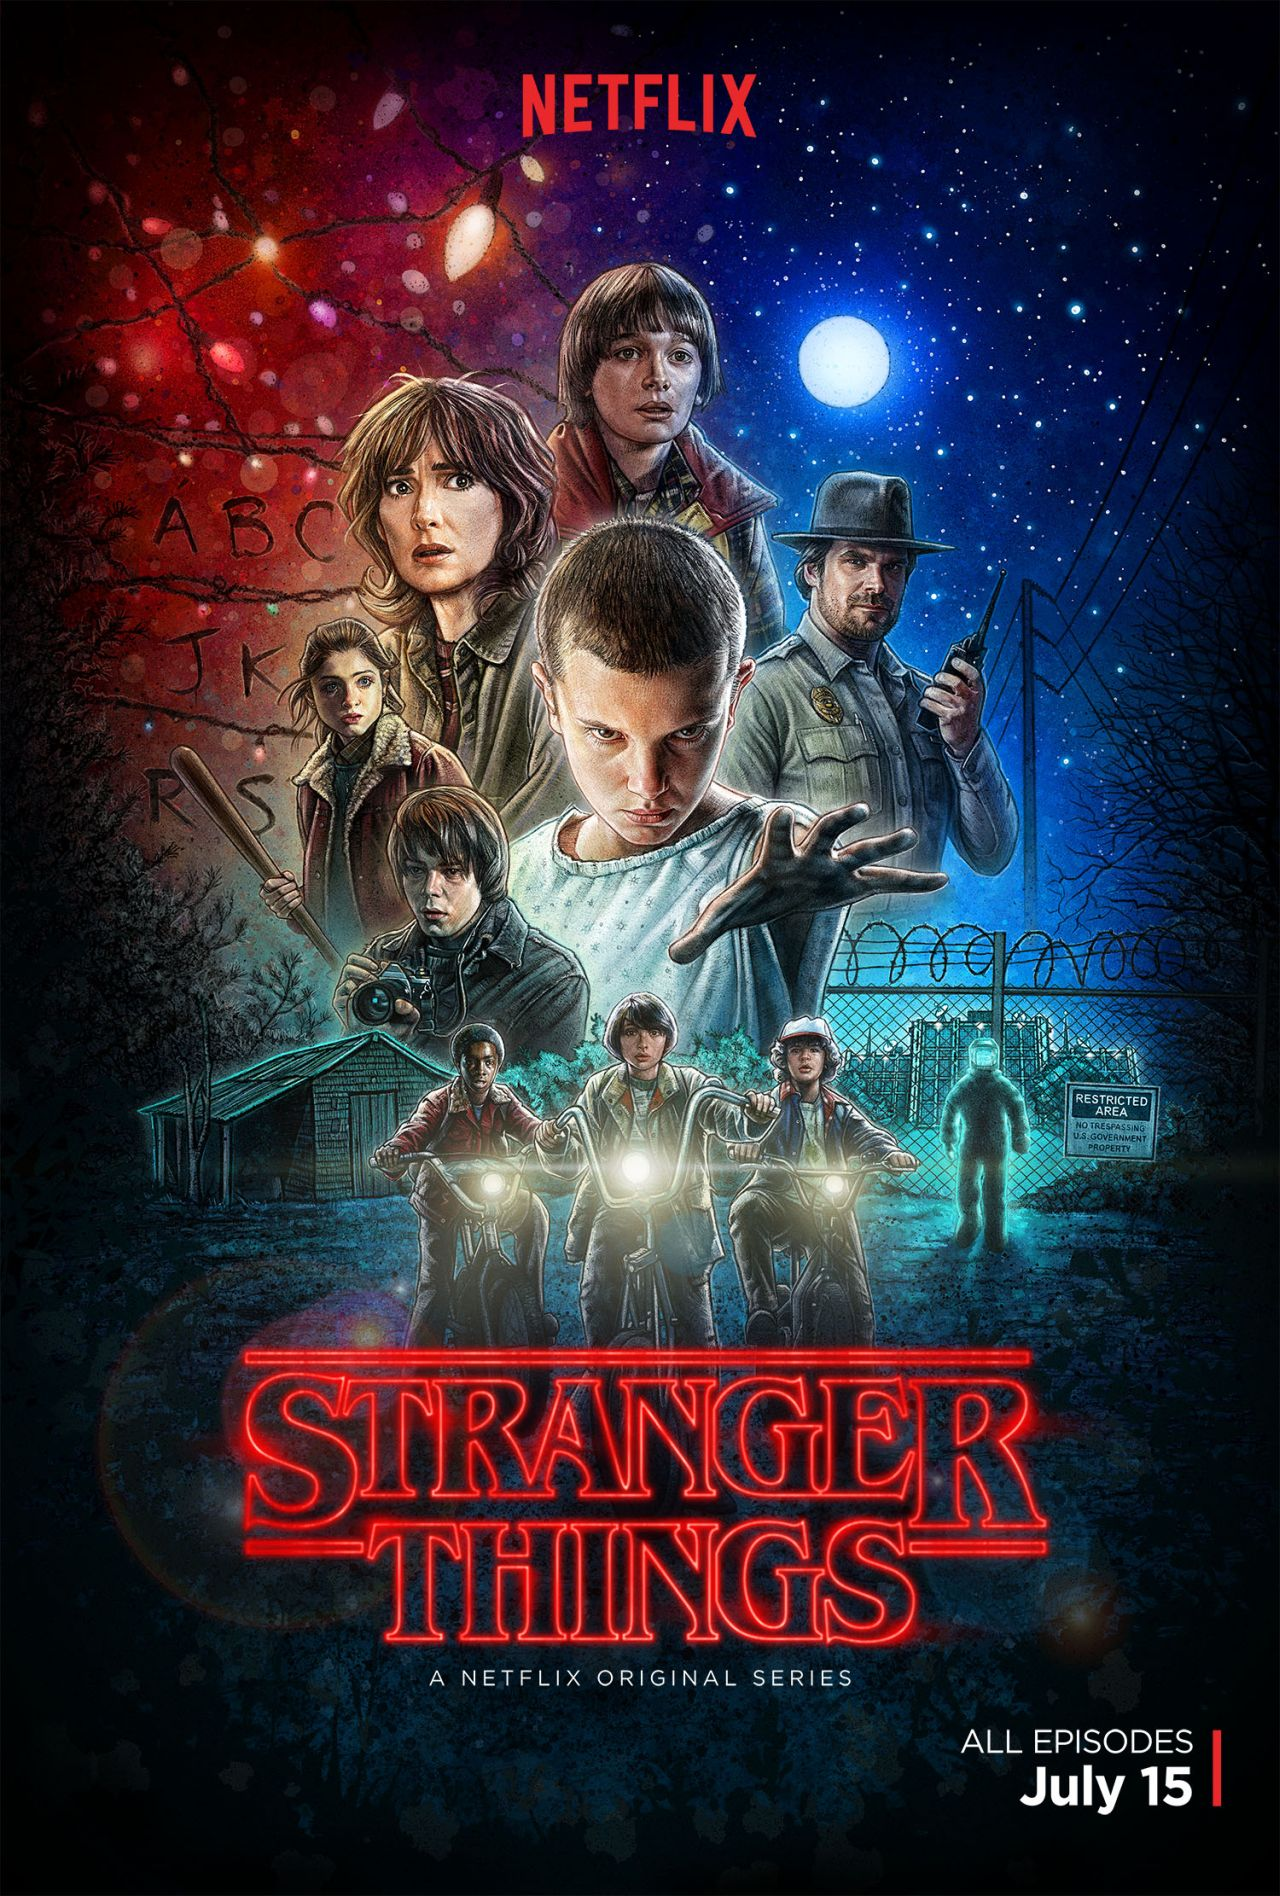 Love Stranger Original Posters Proper